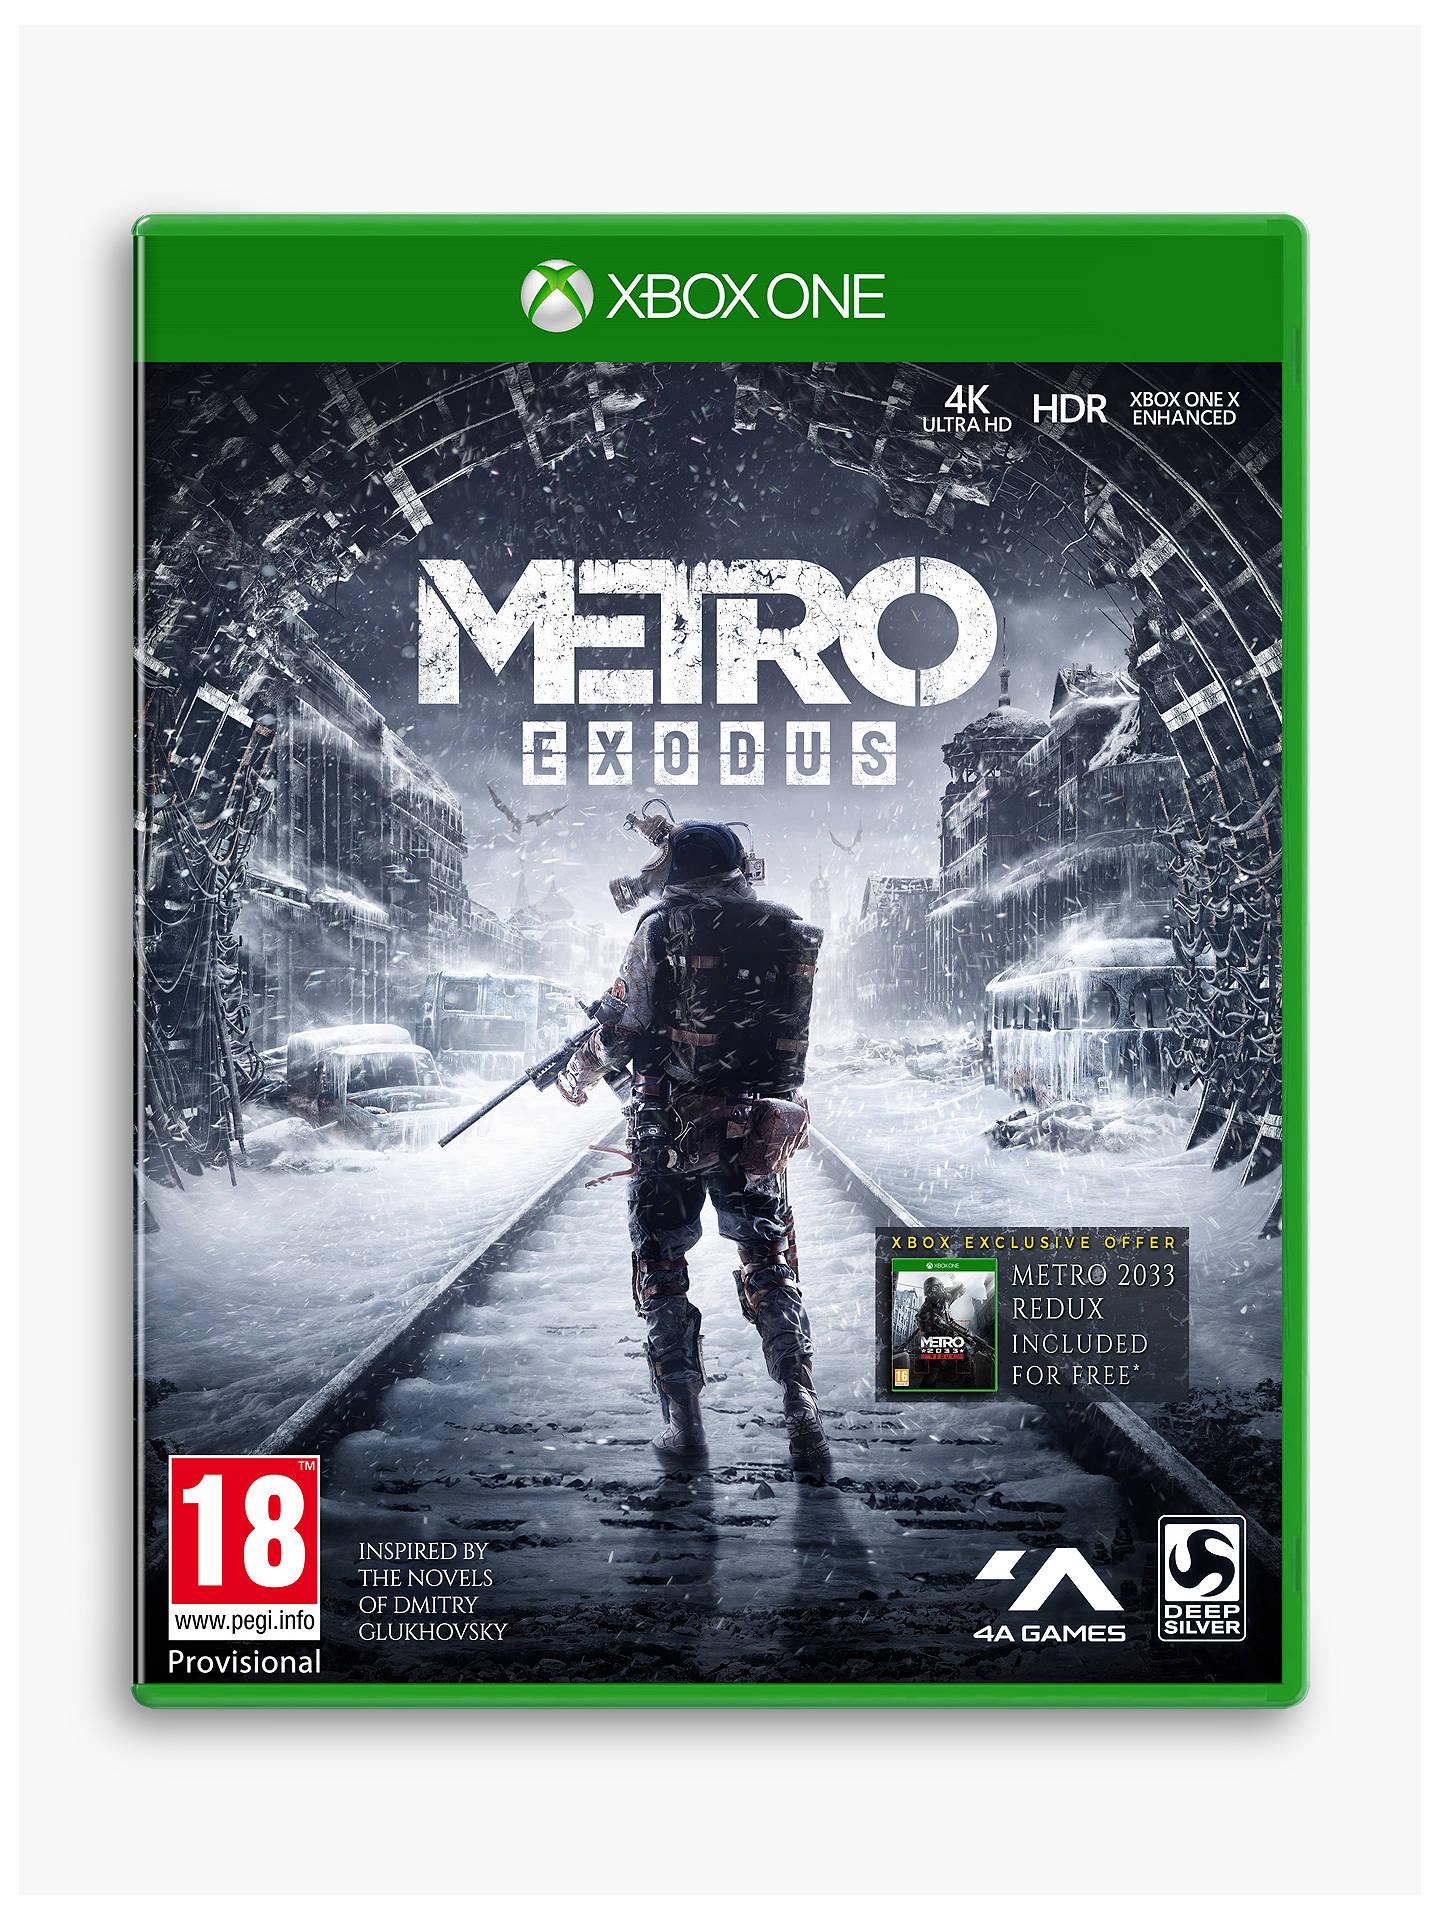 METRO Exodus XBOX ONE game £8.99 Instore @ John Lewis & Partners